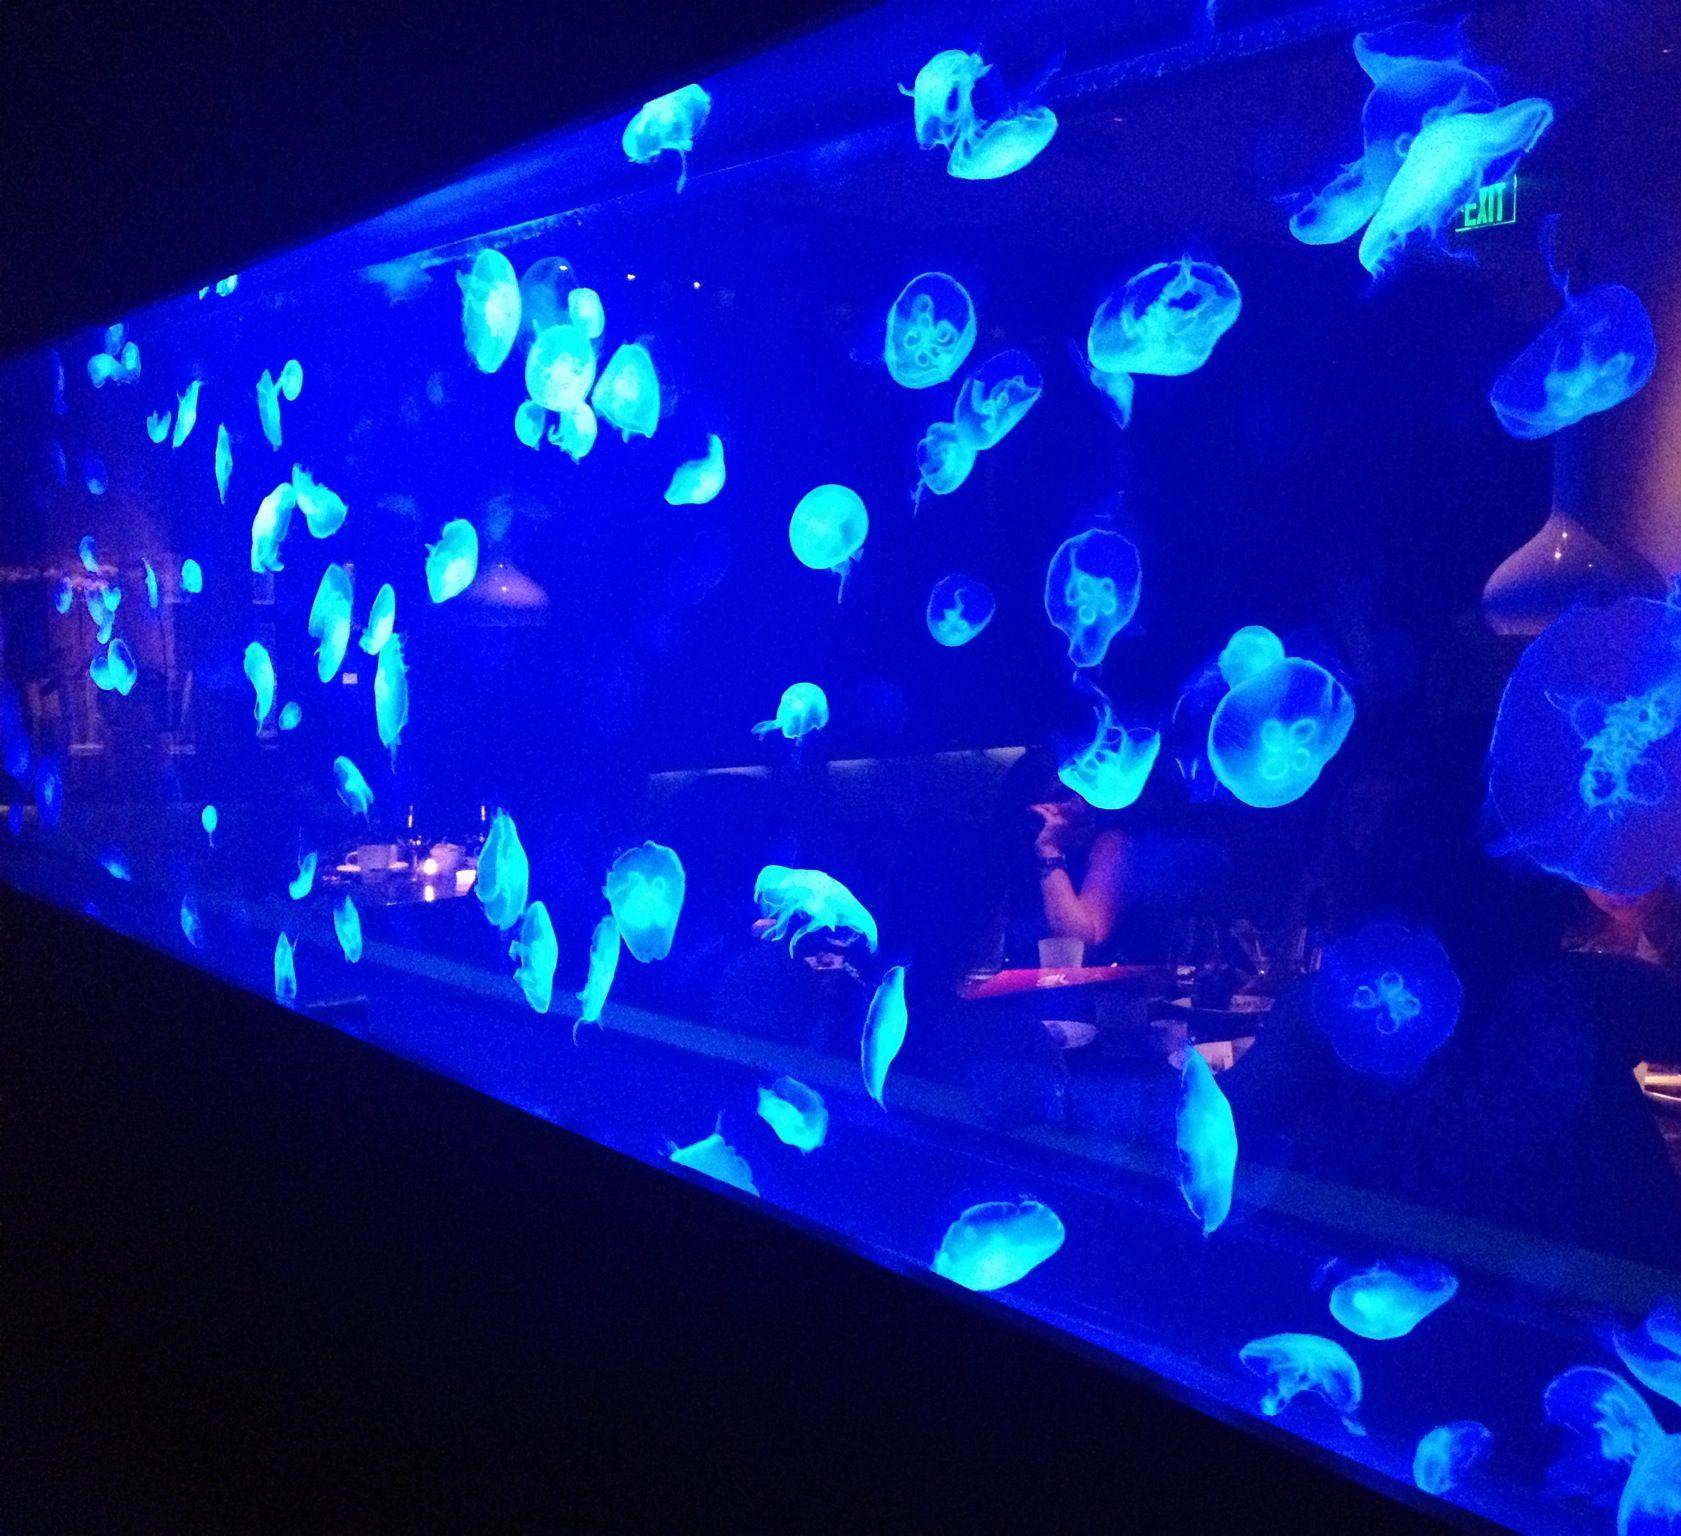 W Fort Lauderdale Steak 954. Amazing Jelly Fish tank ...